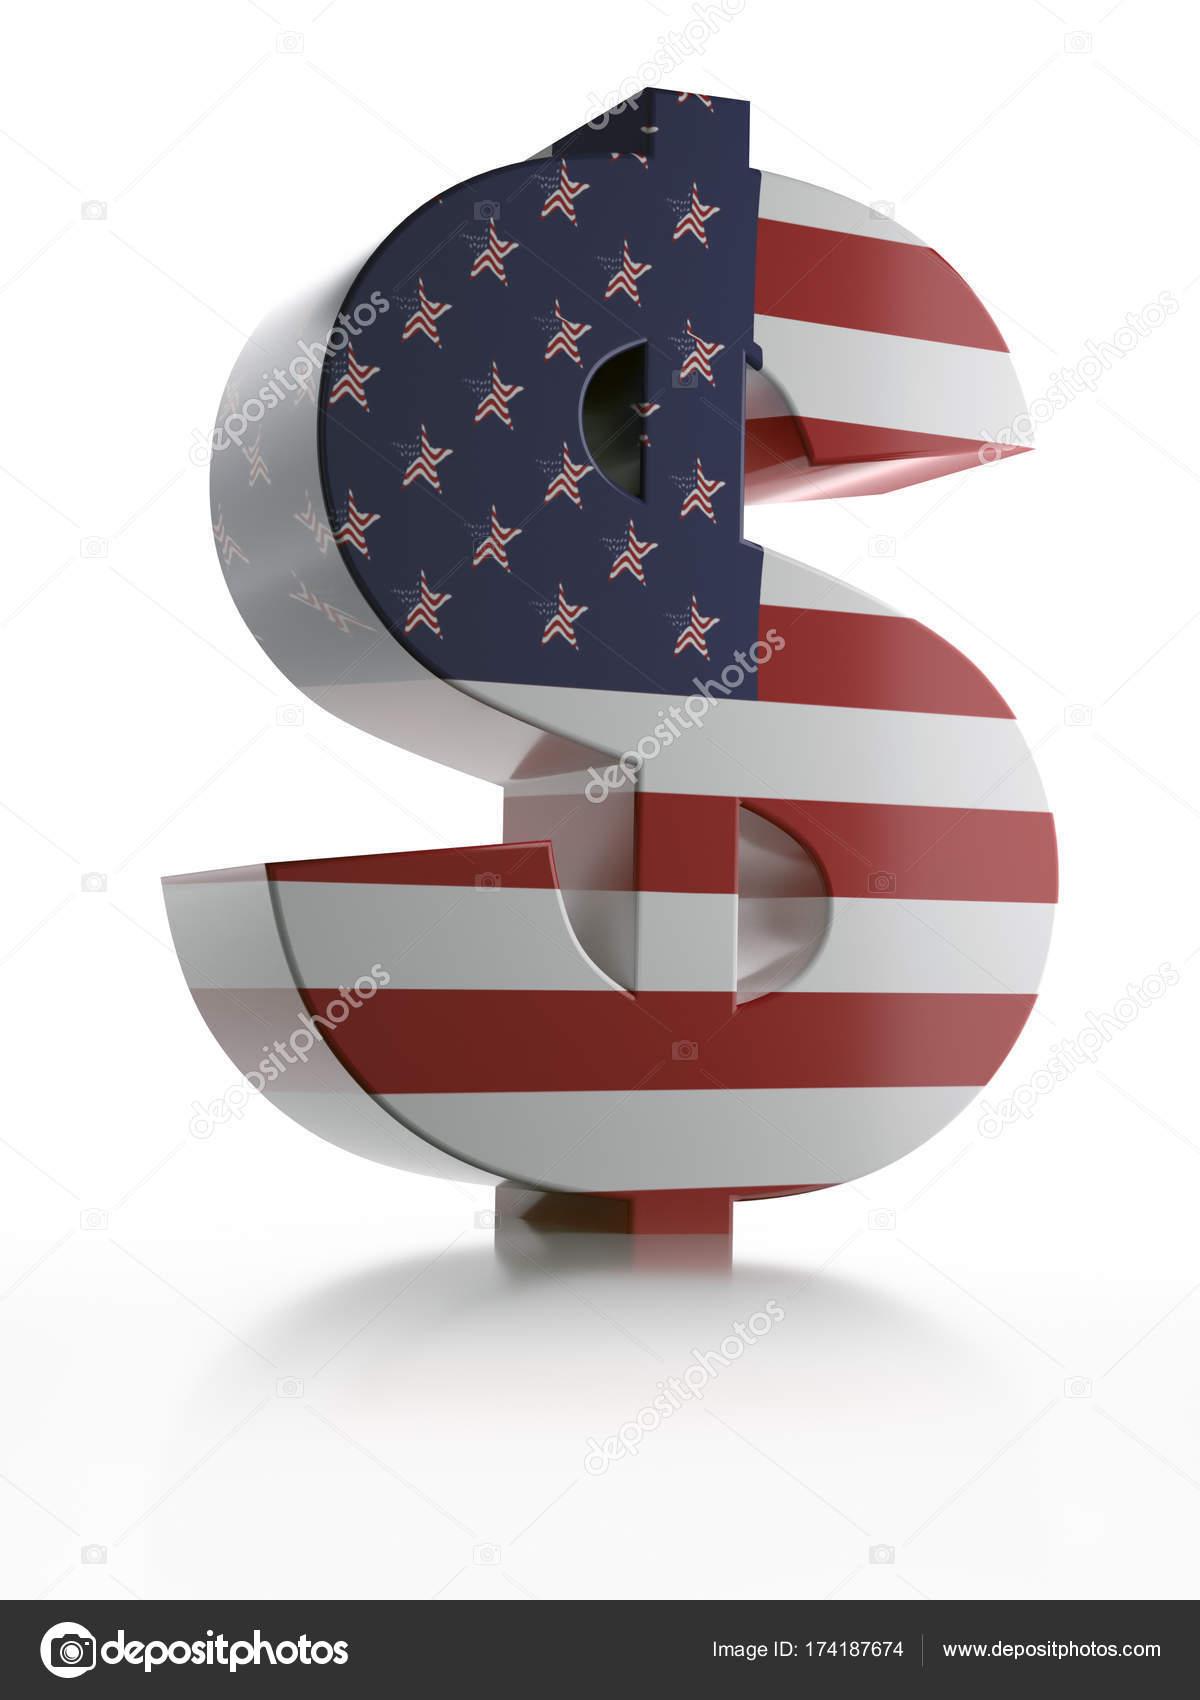 3d Usd Currency Symbol Stock Photo Pryzmat 174187674